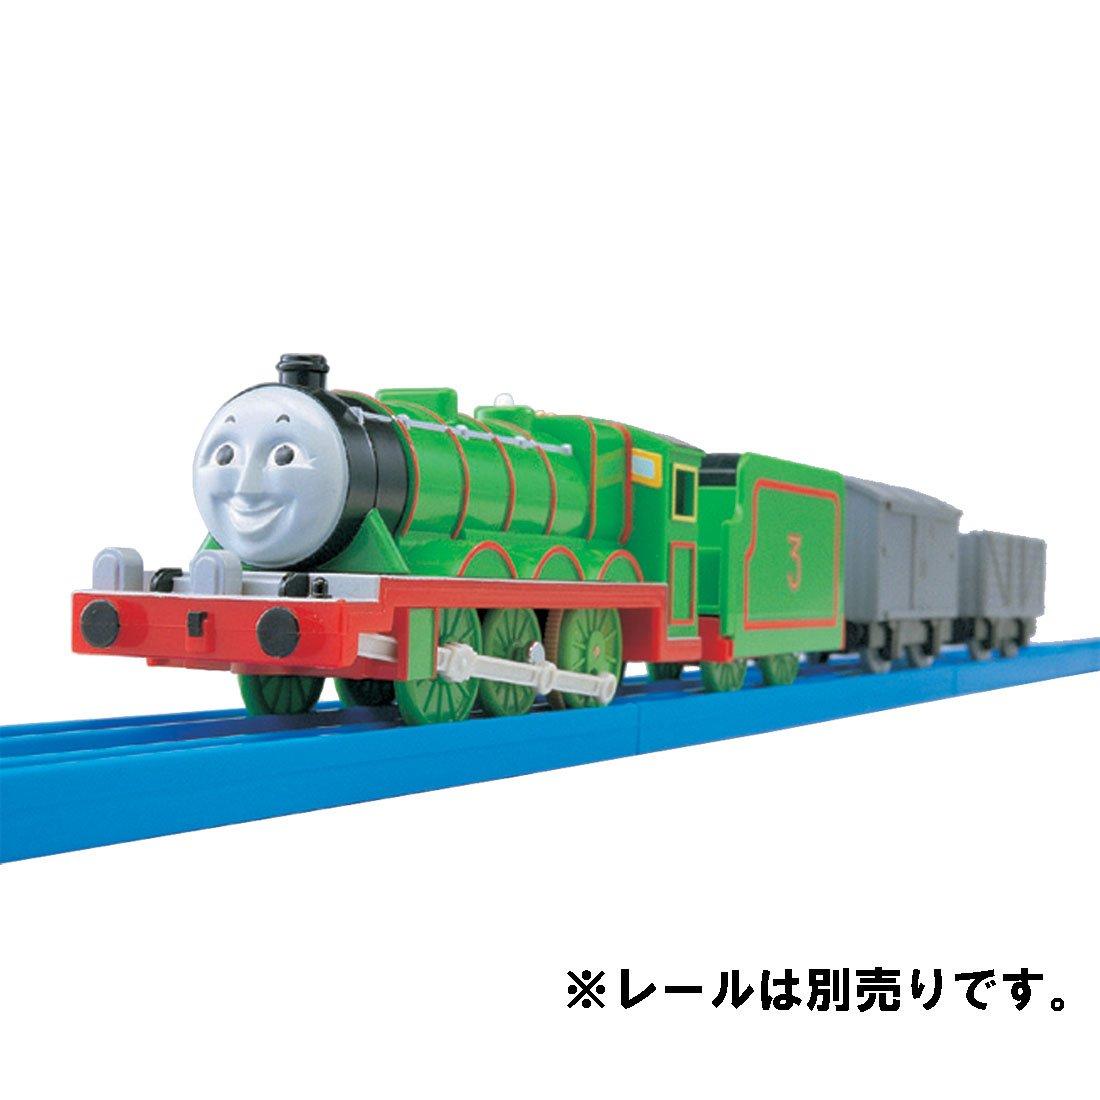 Amazon.com: THOMAS & FRIENDS: TS-03 Plarail Henry (Model Train) by ...